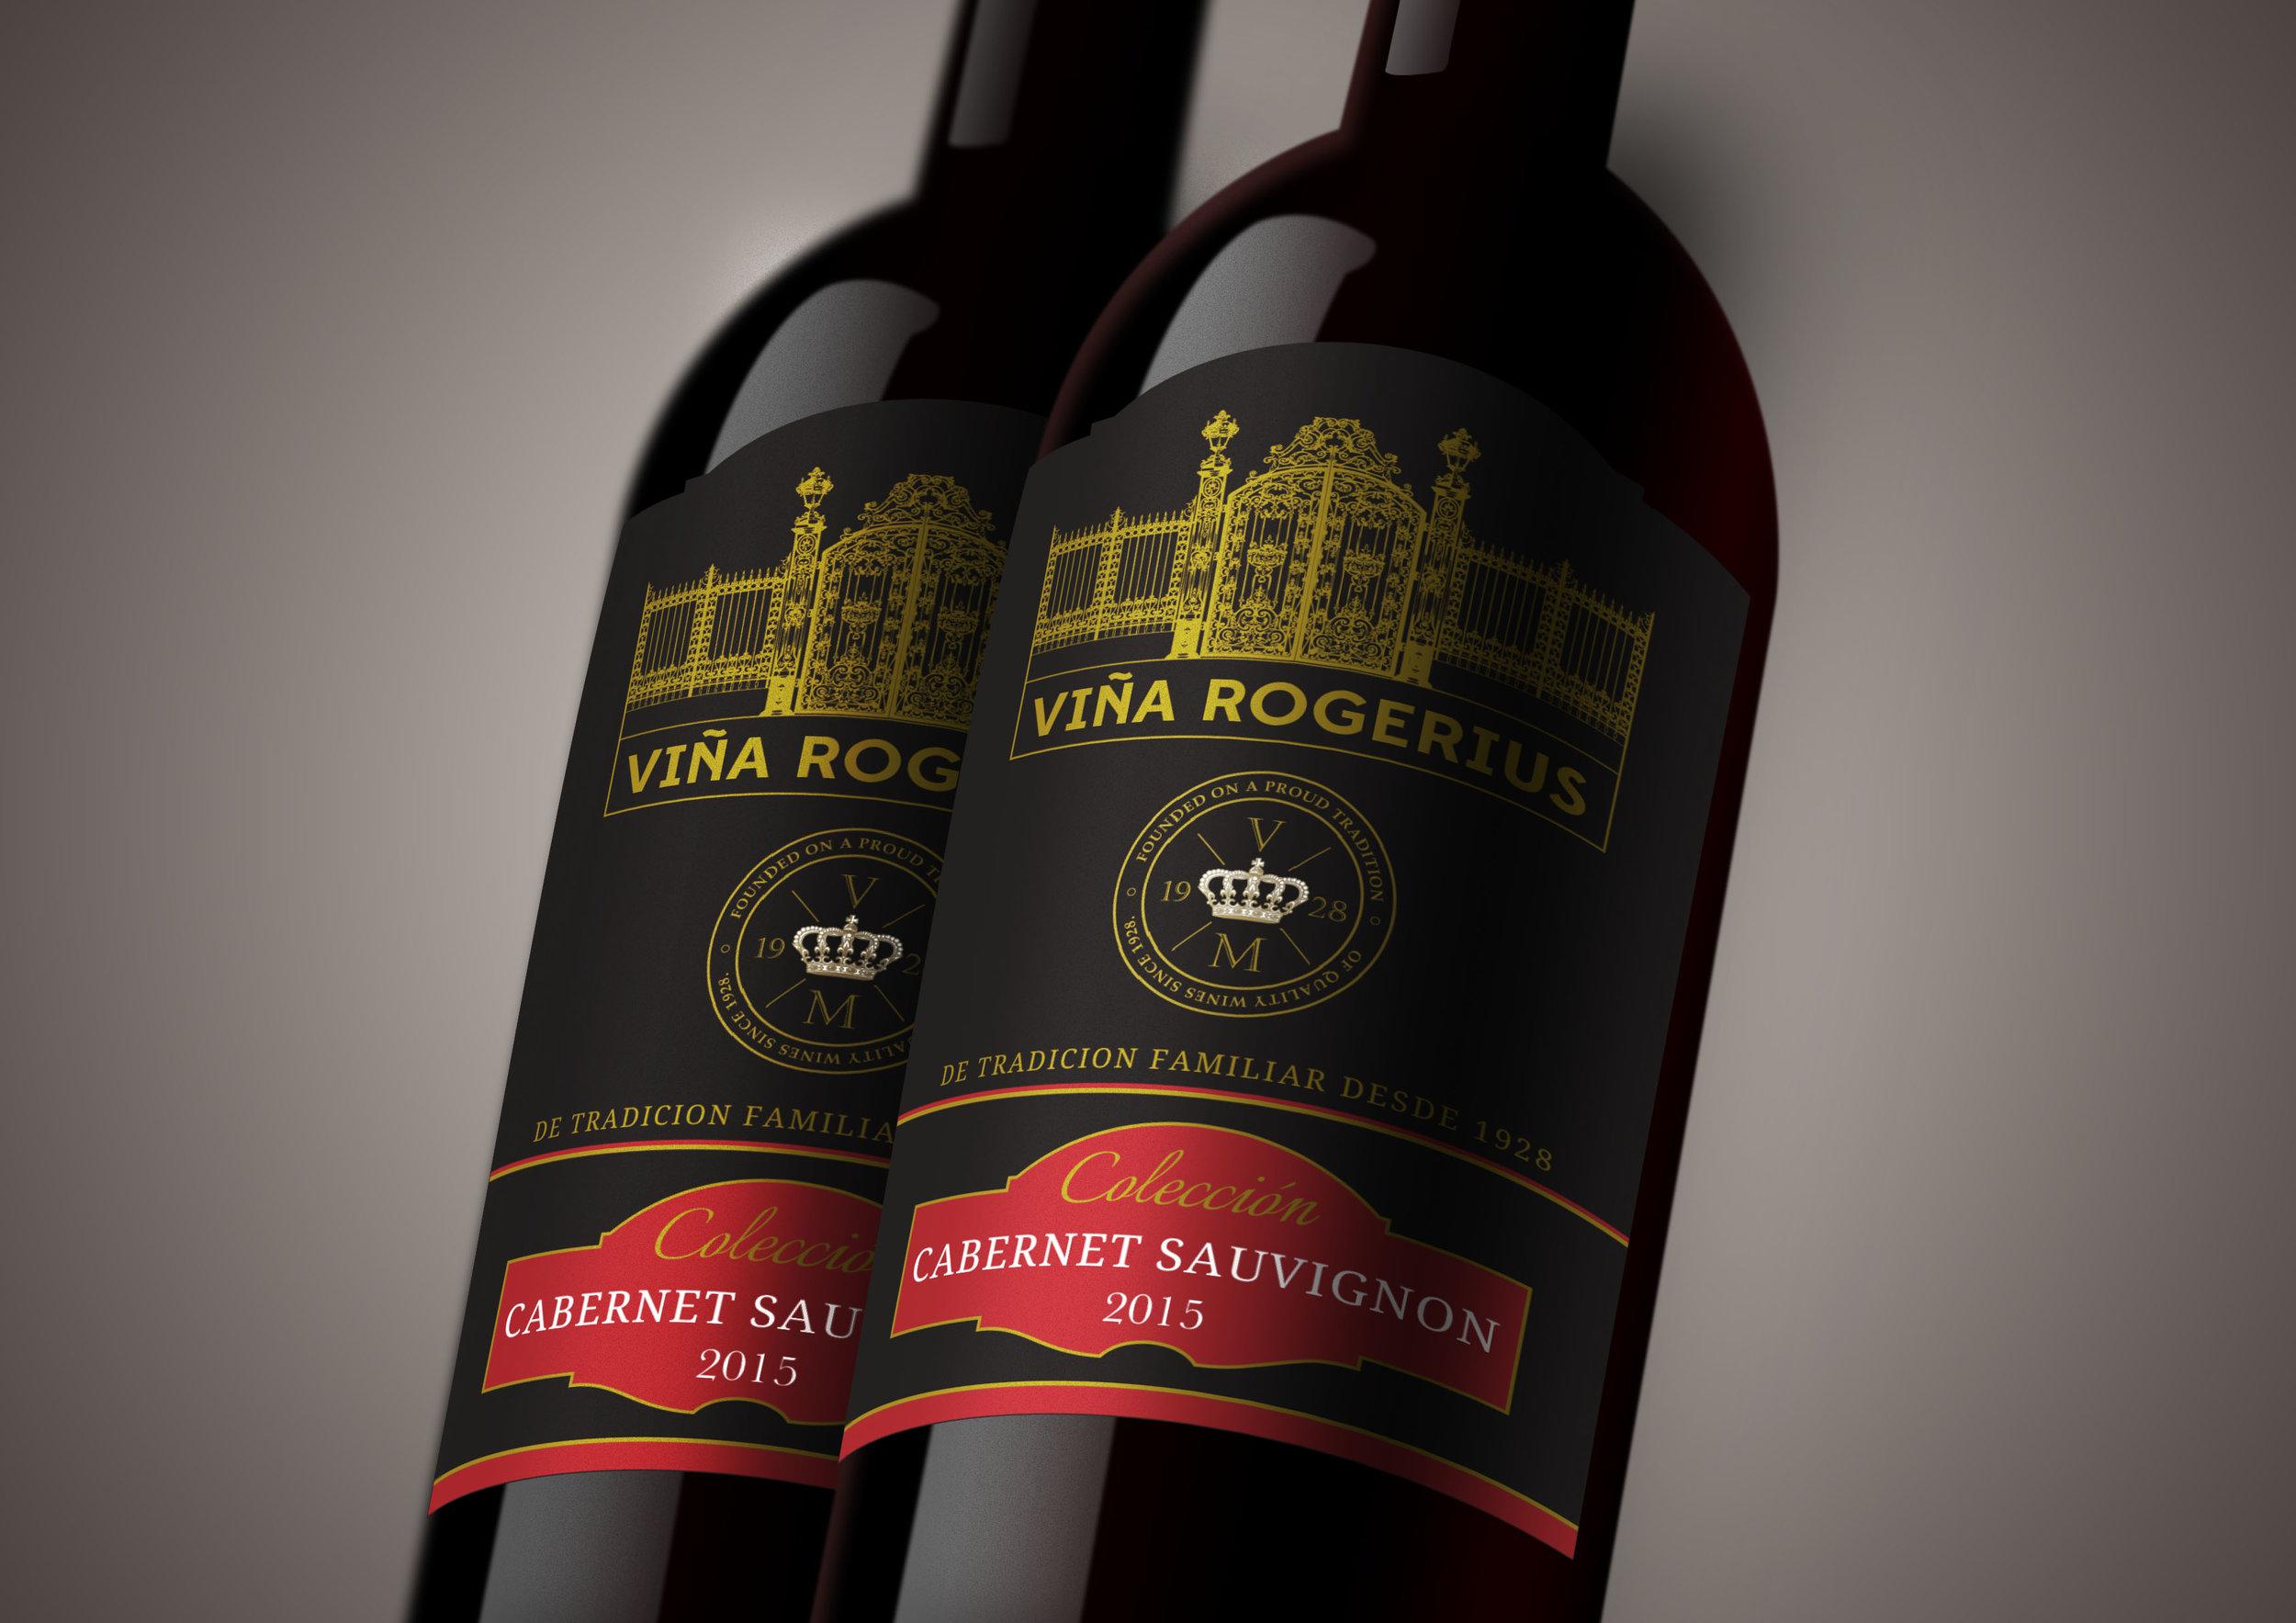 Vina Rogerius 2 Bottle Shot Mock Up.jpg